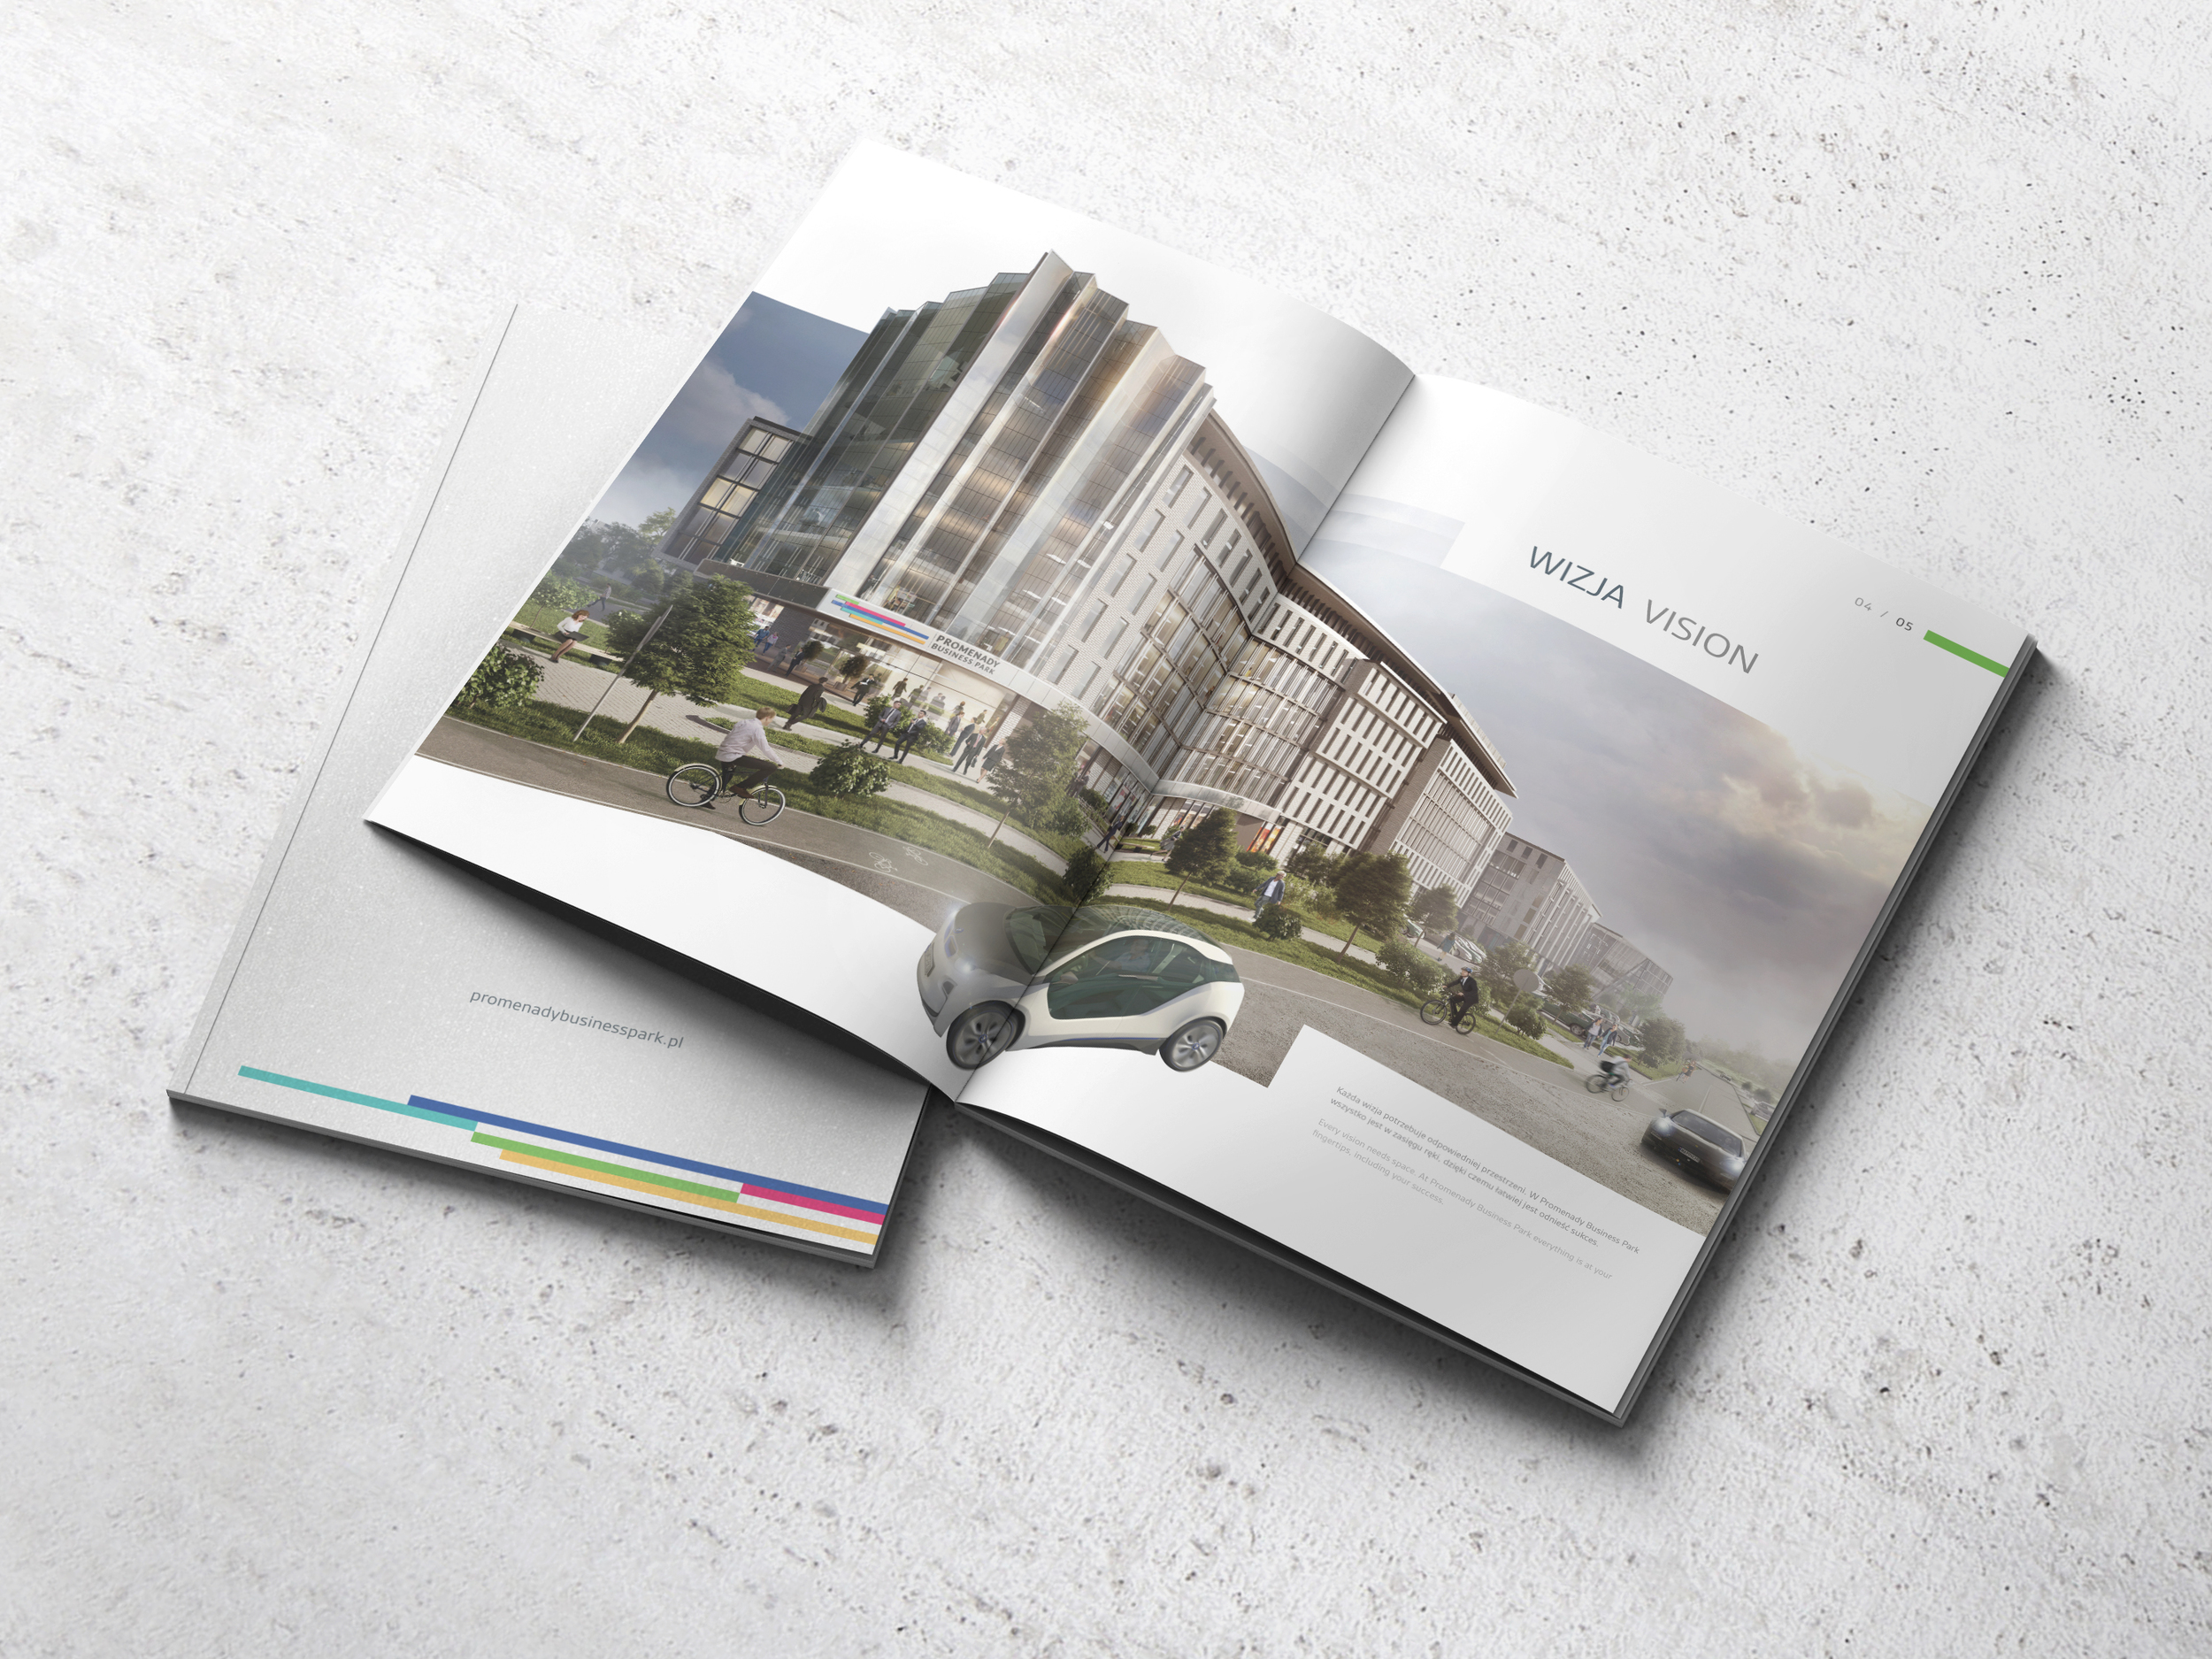 2015 Vantage Promenady brochure 2.jpg